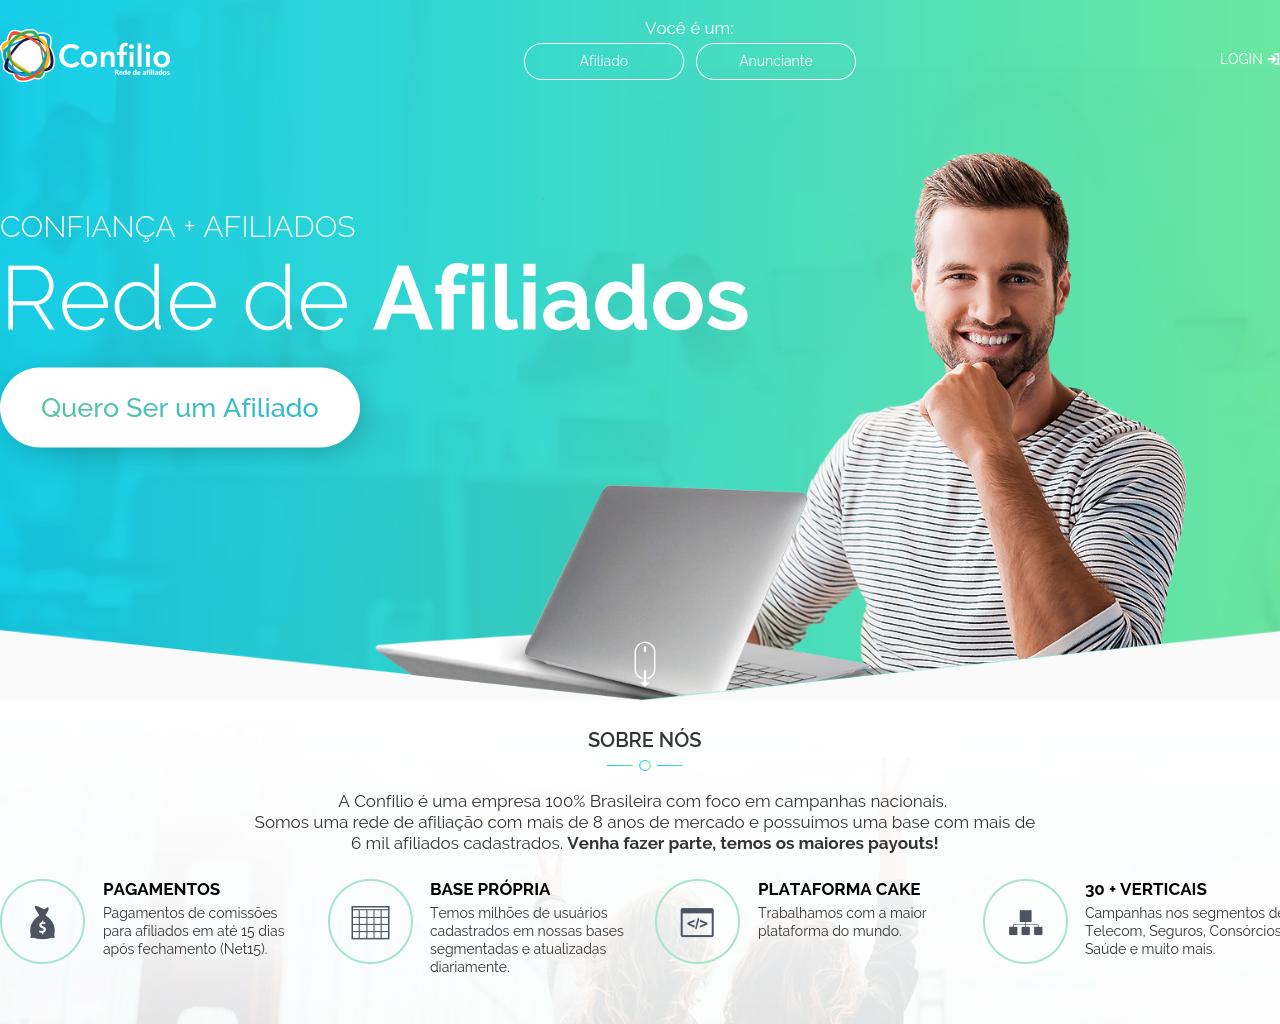 Confilio-Advertising-Reviews-Pricing